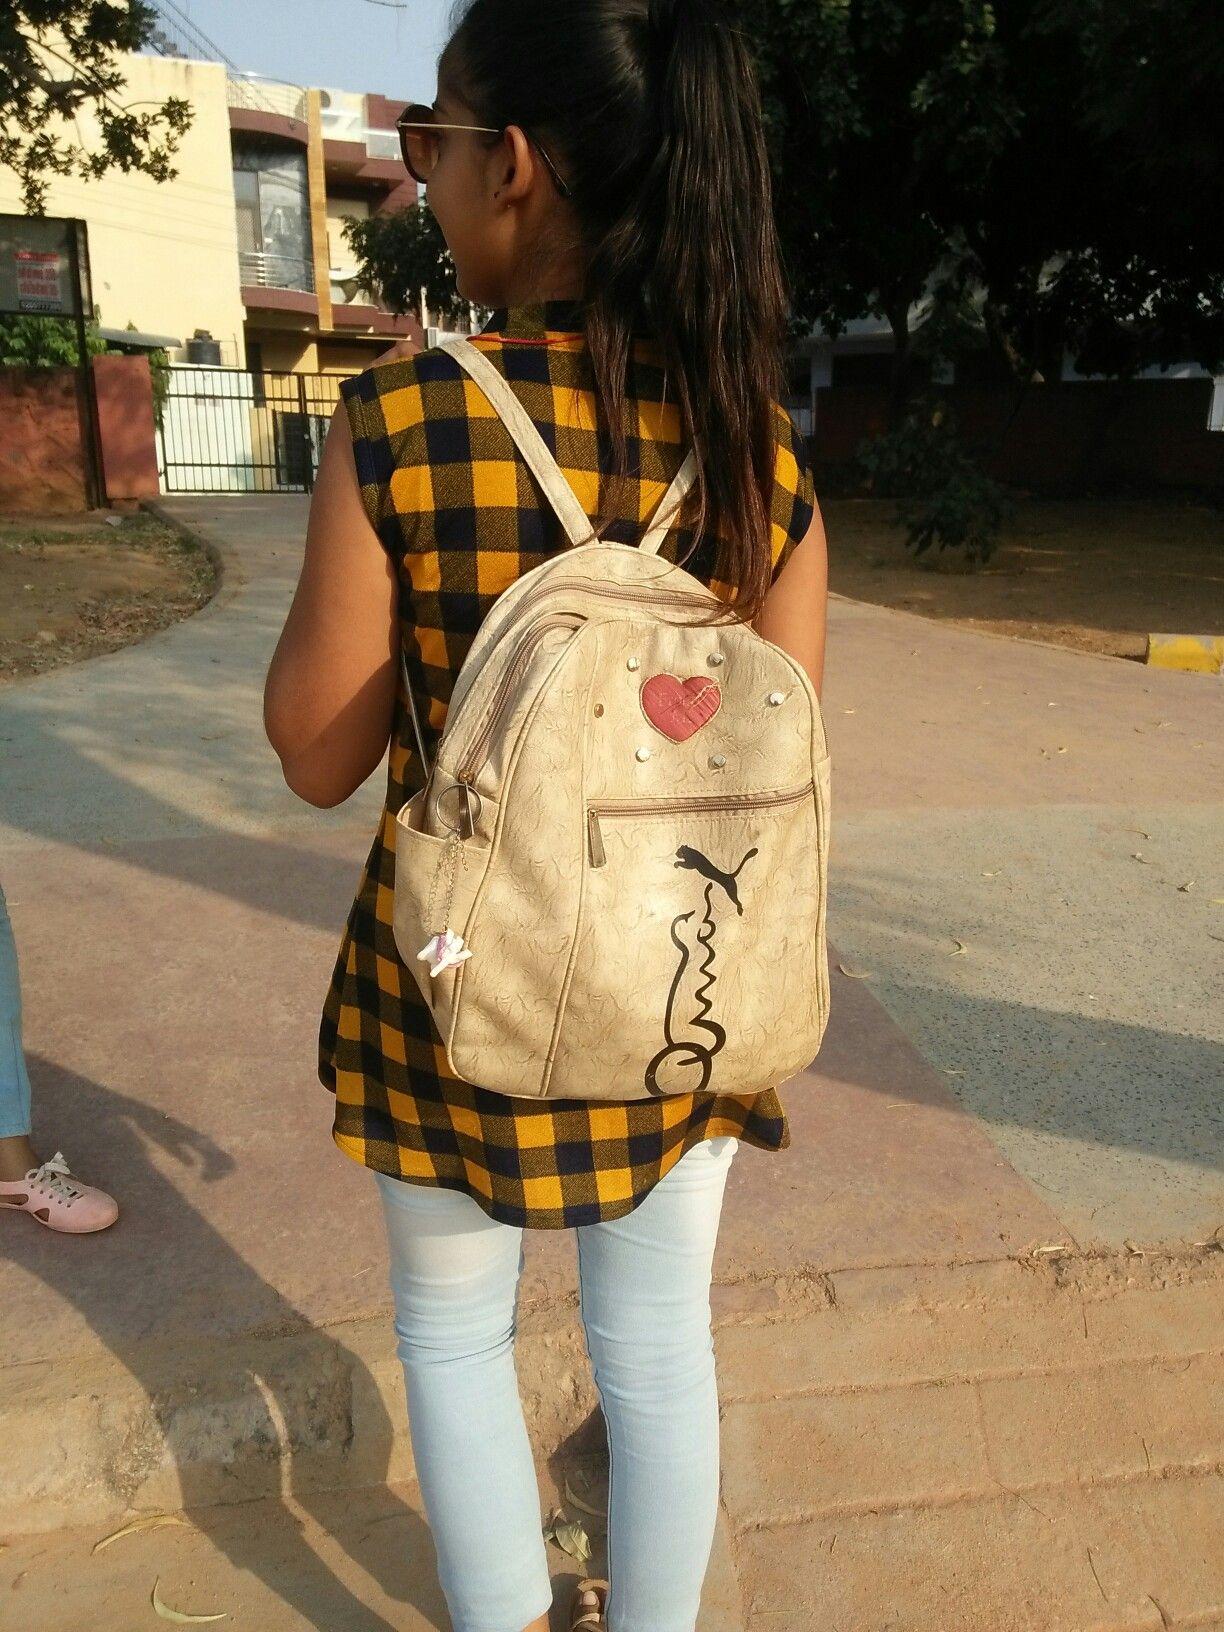 Rashikaprajapatgmailcom  Hidden Face Dpz In 2019 -7158